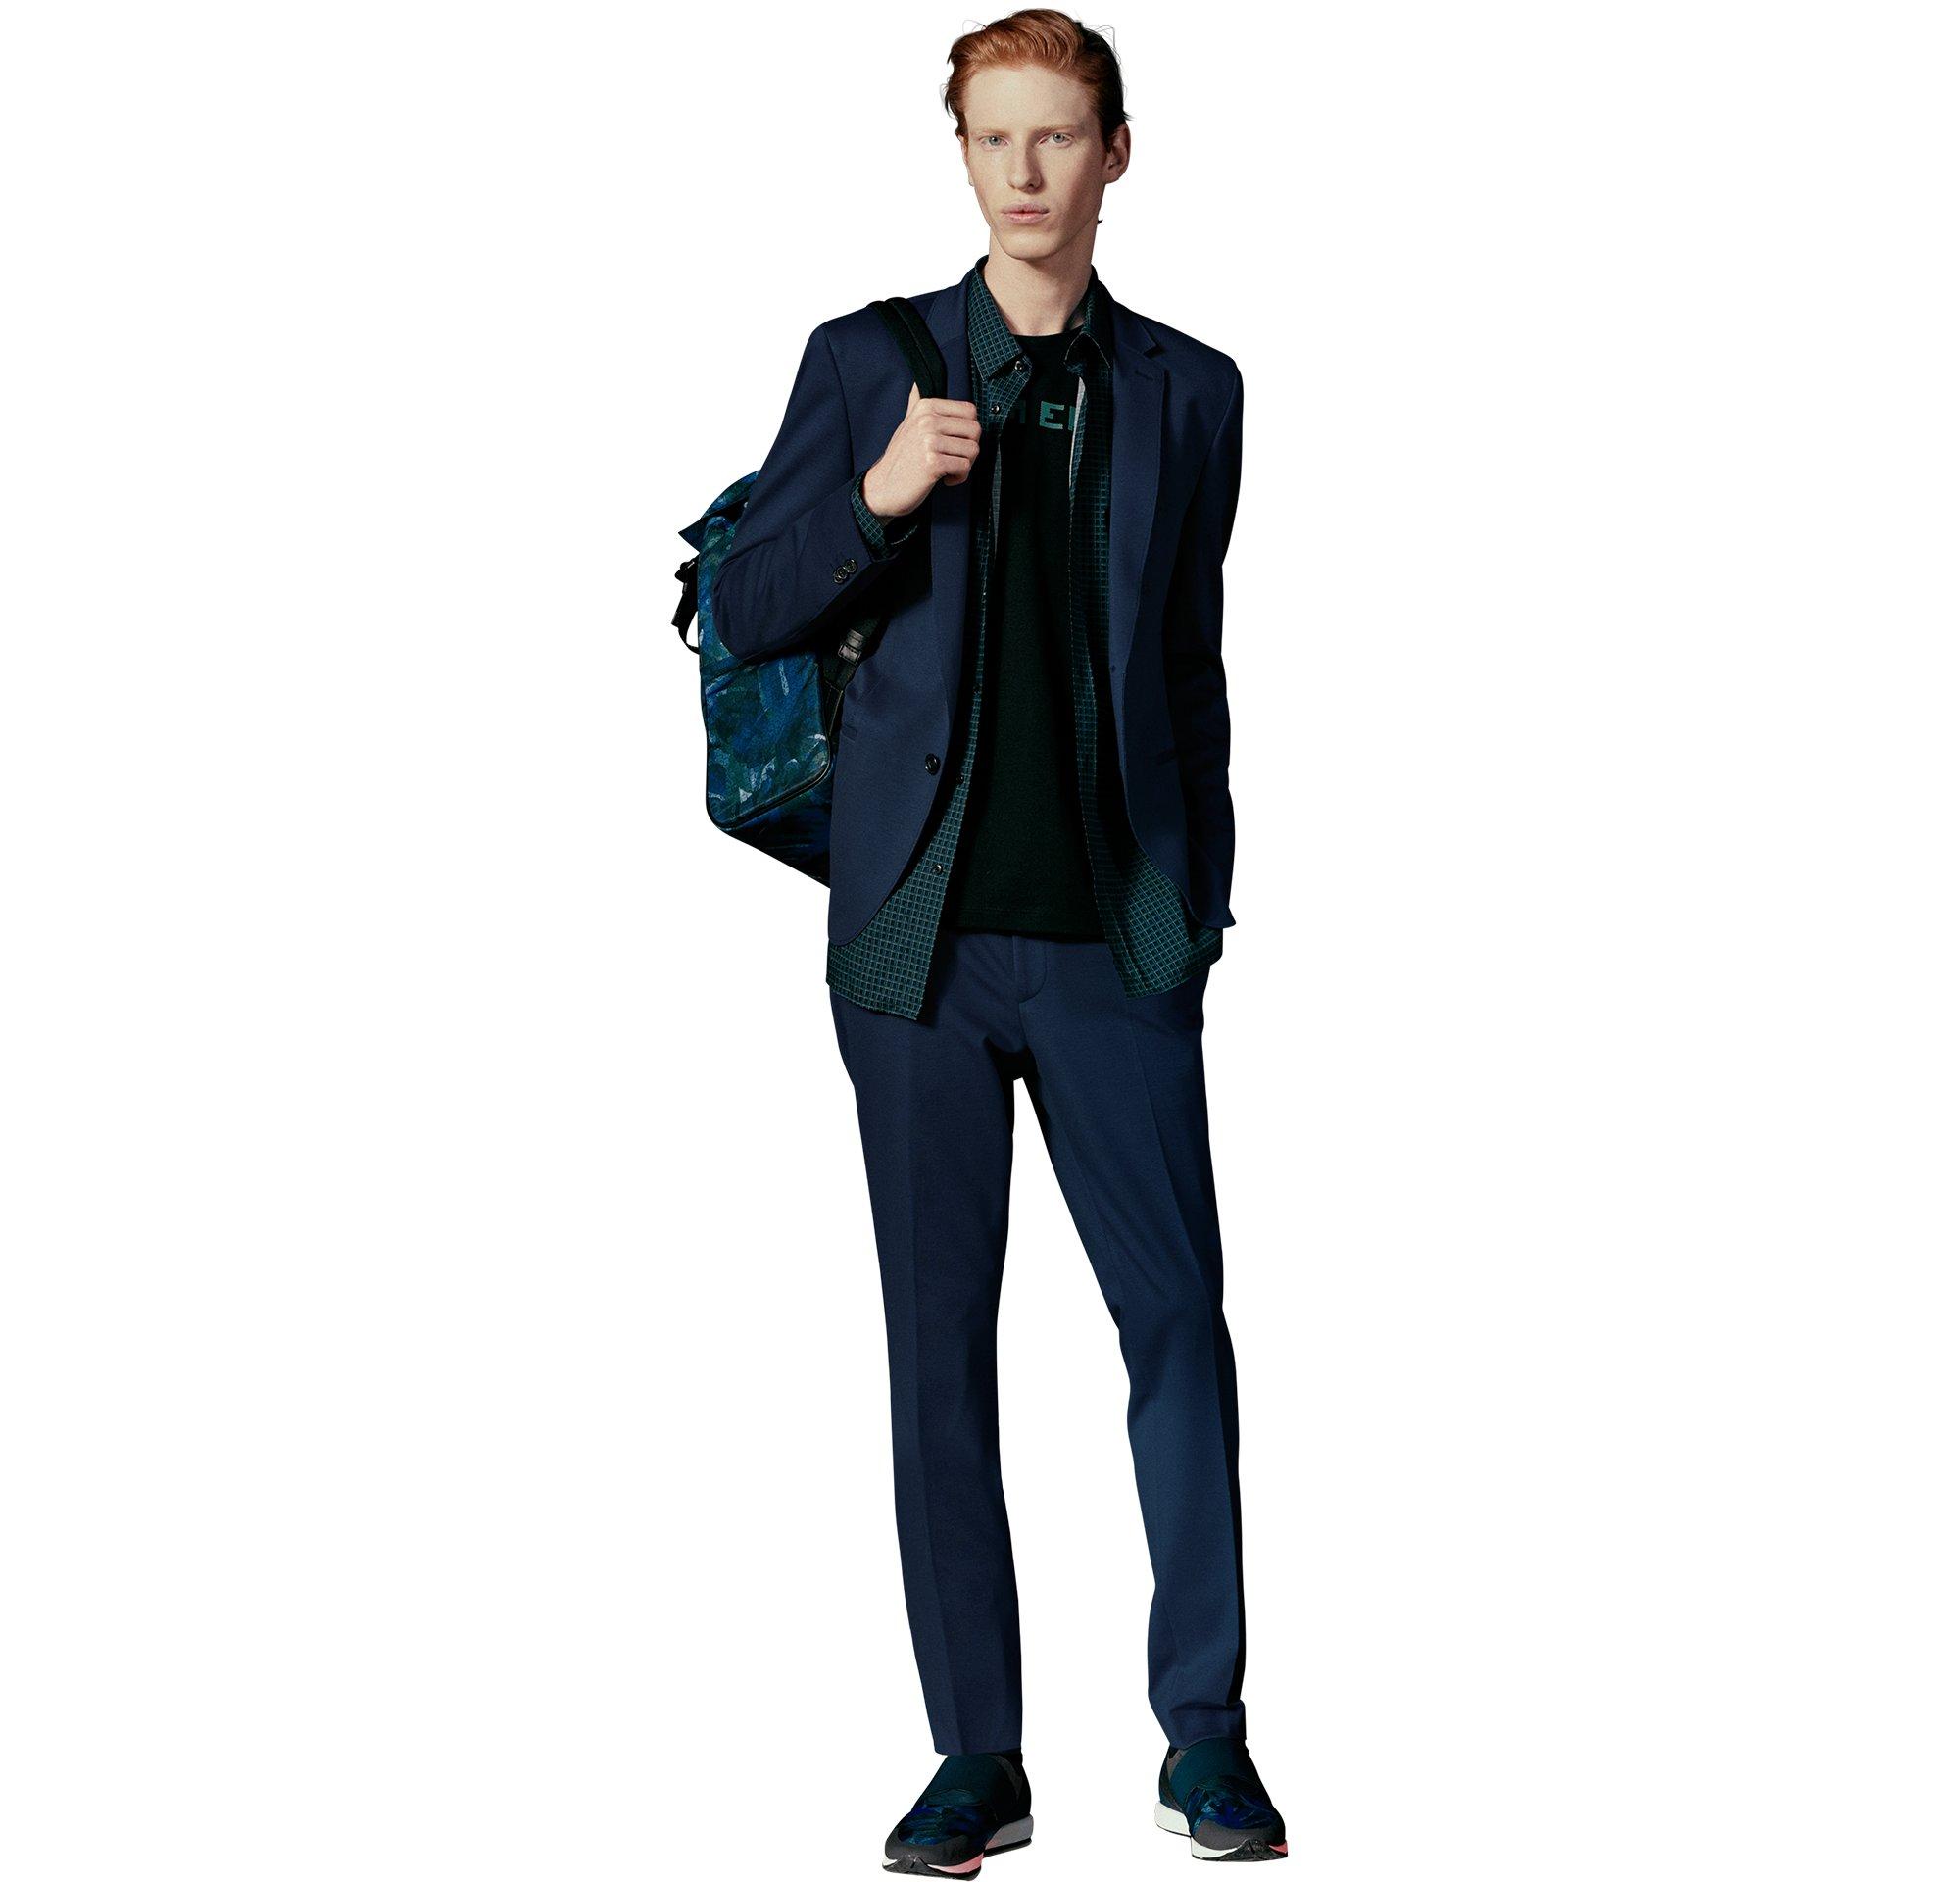 Suit, shirt, bag by HUGO